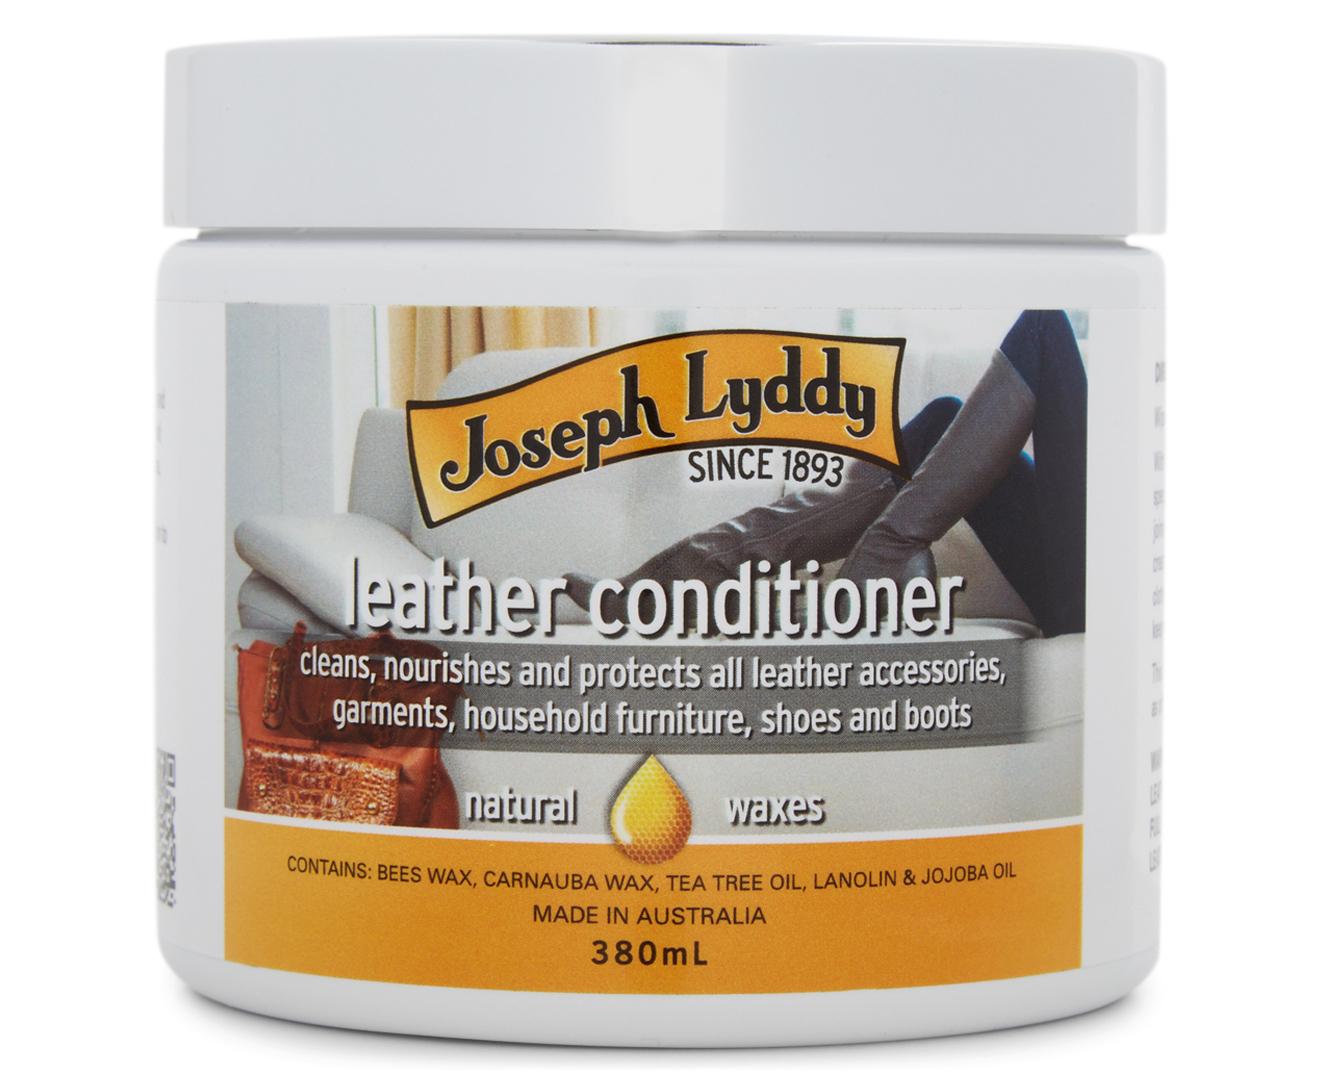 Joseph Lyddy Leather Conditioner 380ml Groceryrun Com Au